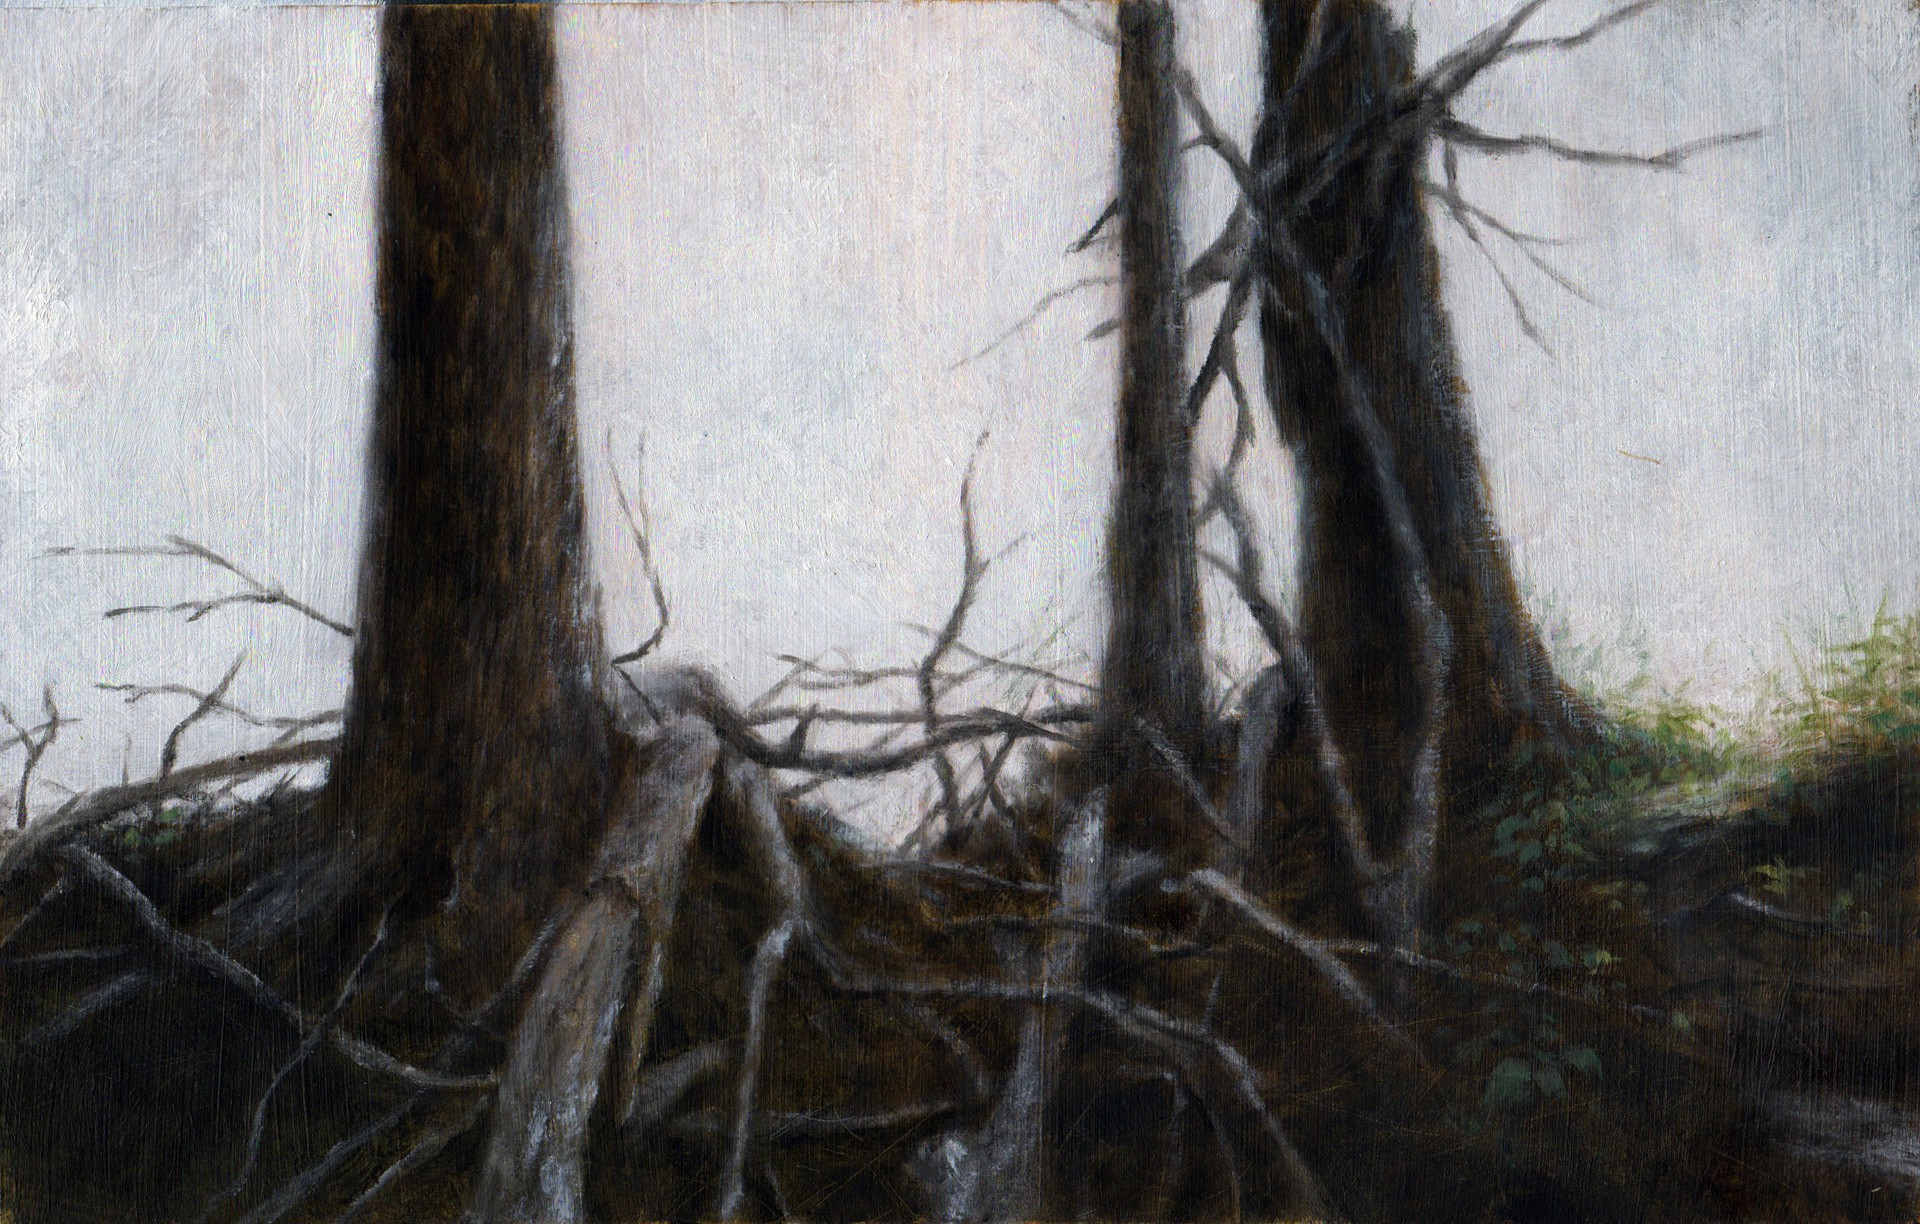 Hemlock Trees at Sunset by Lisa Lebofsky